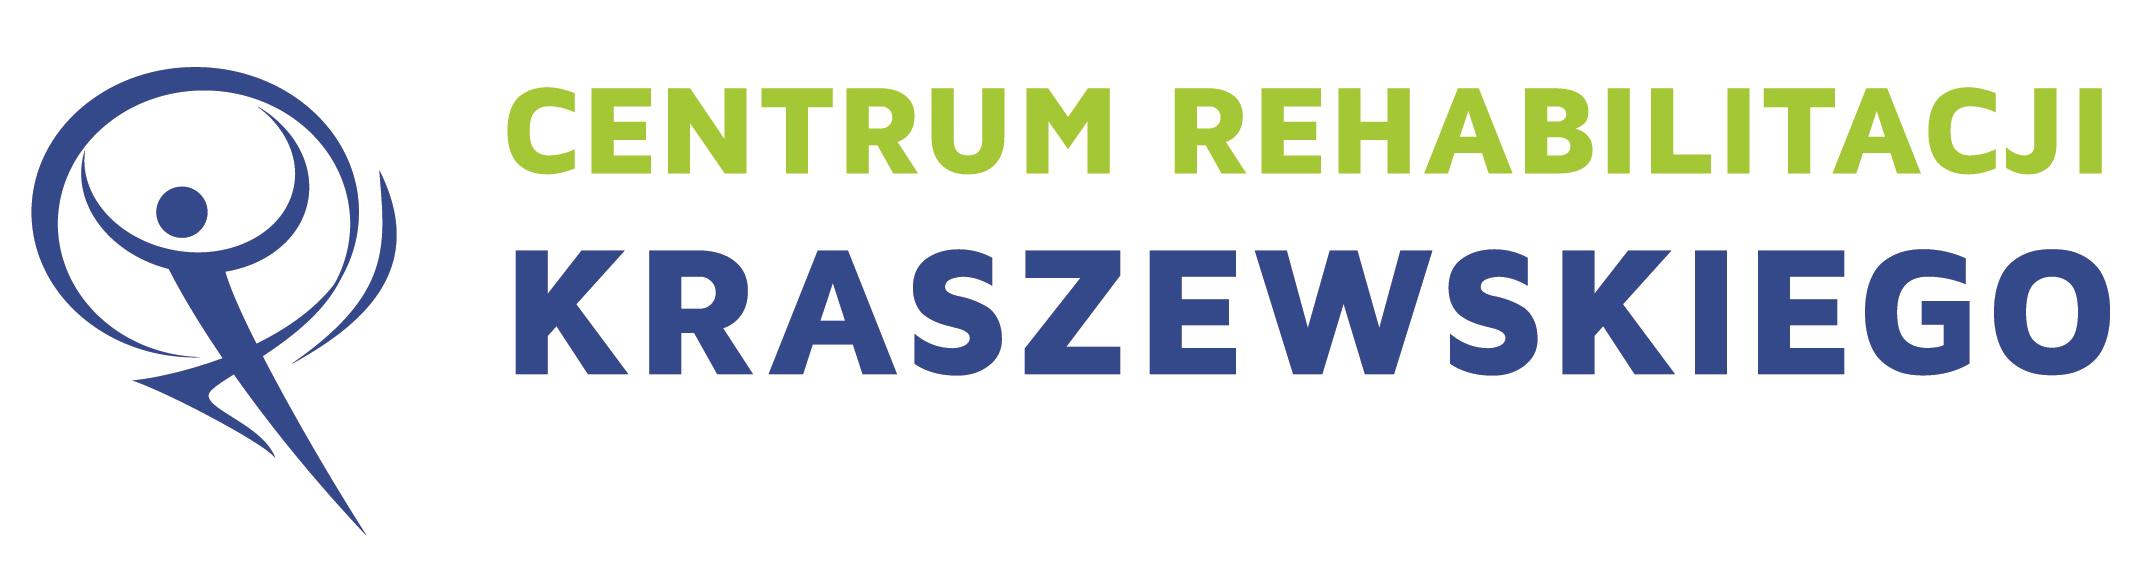 logo centrum rehabilitacji